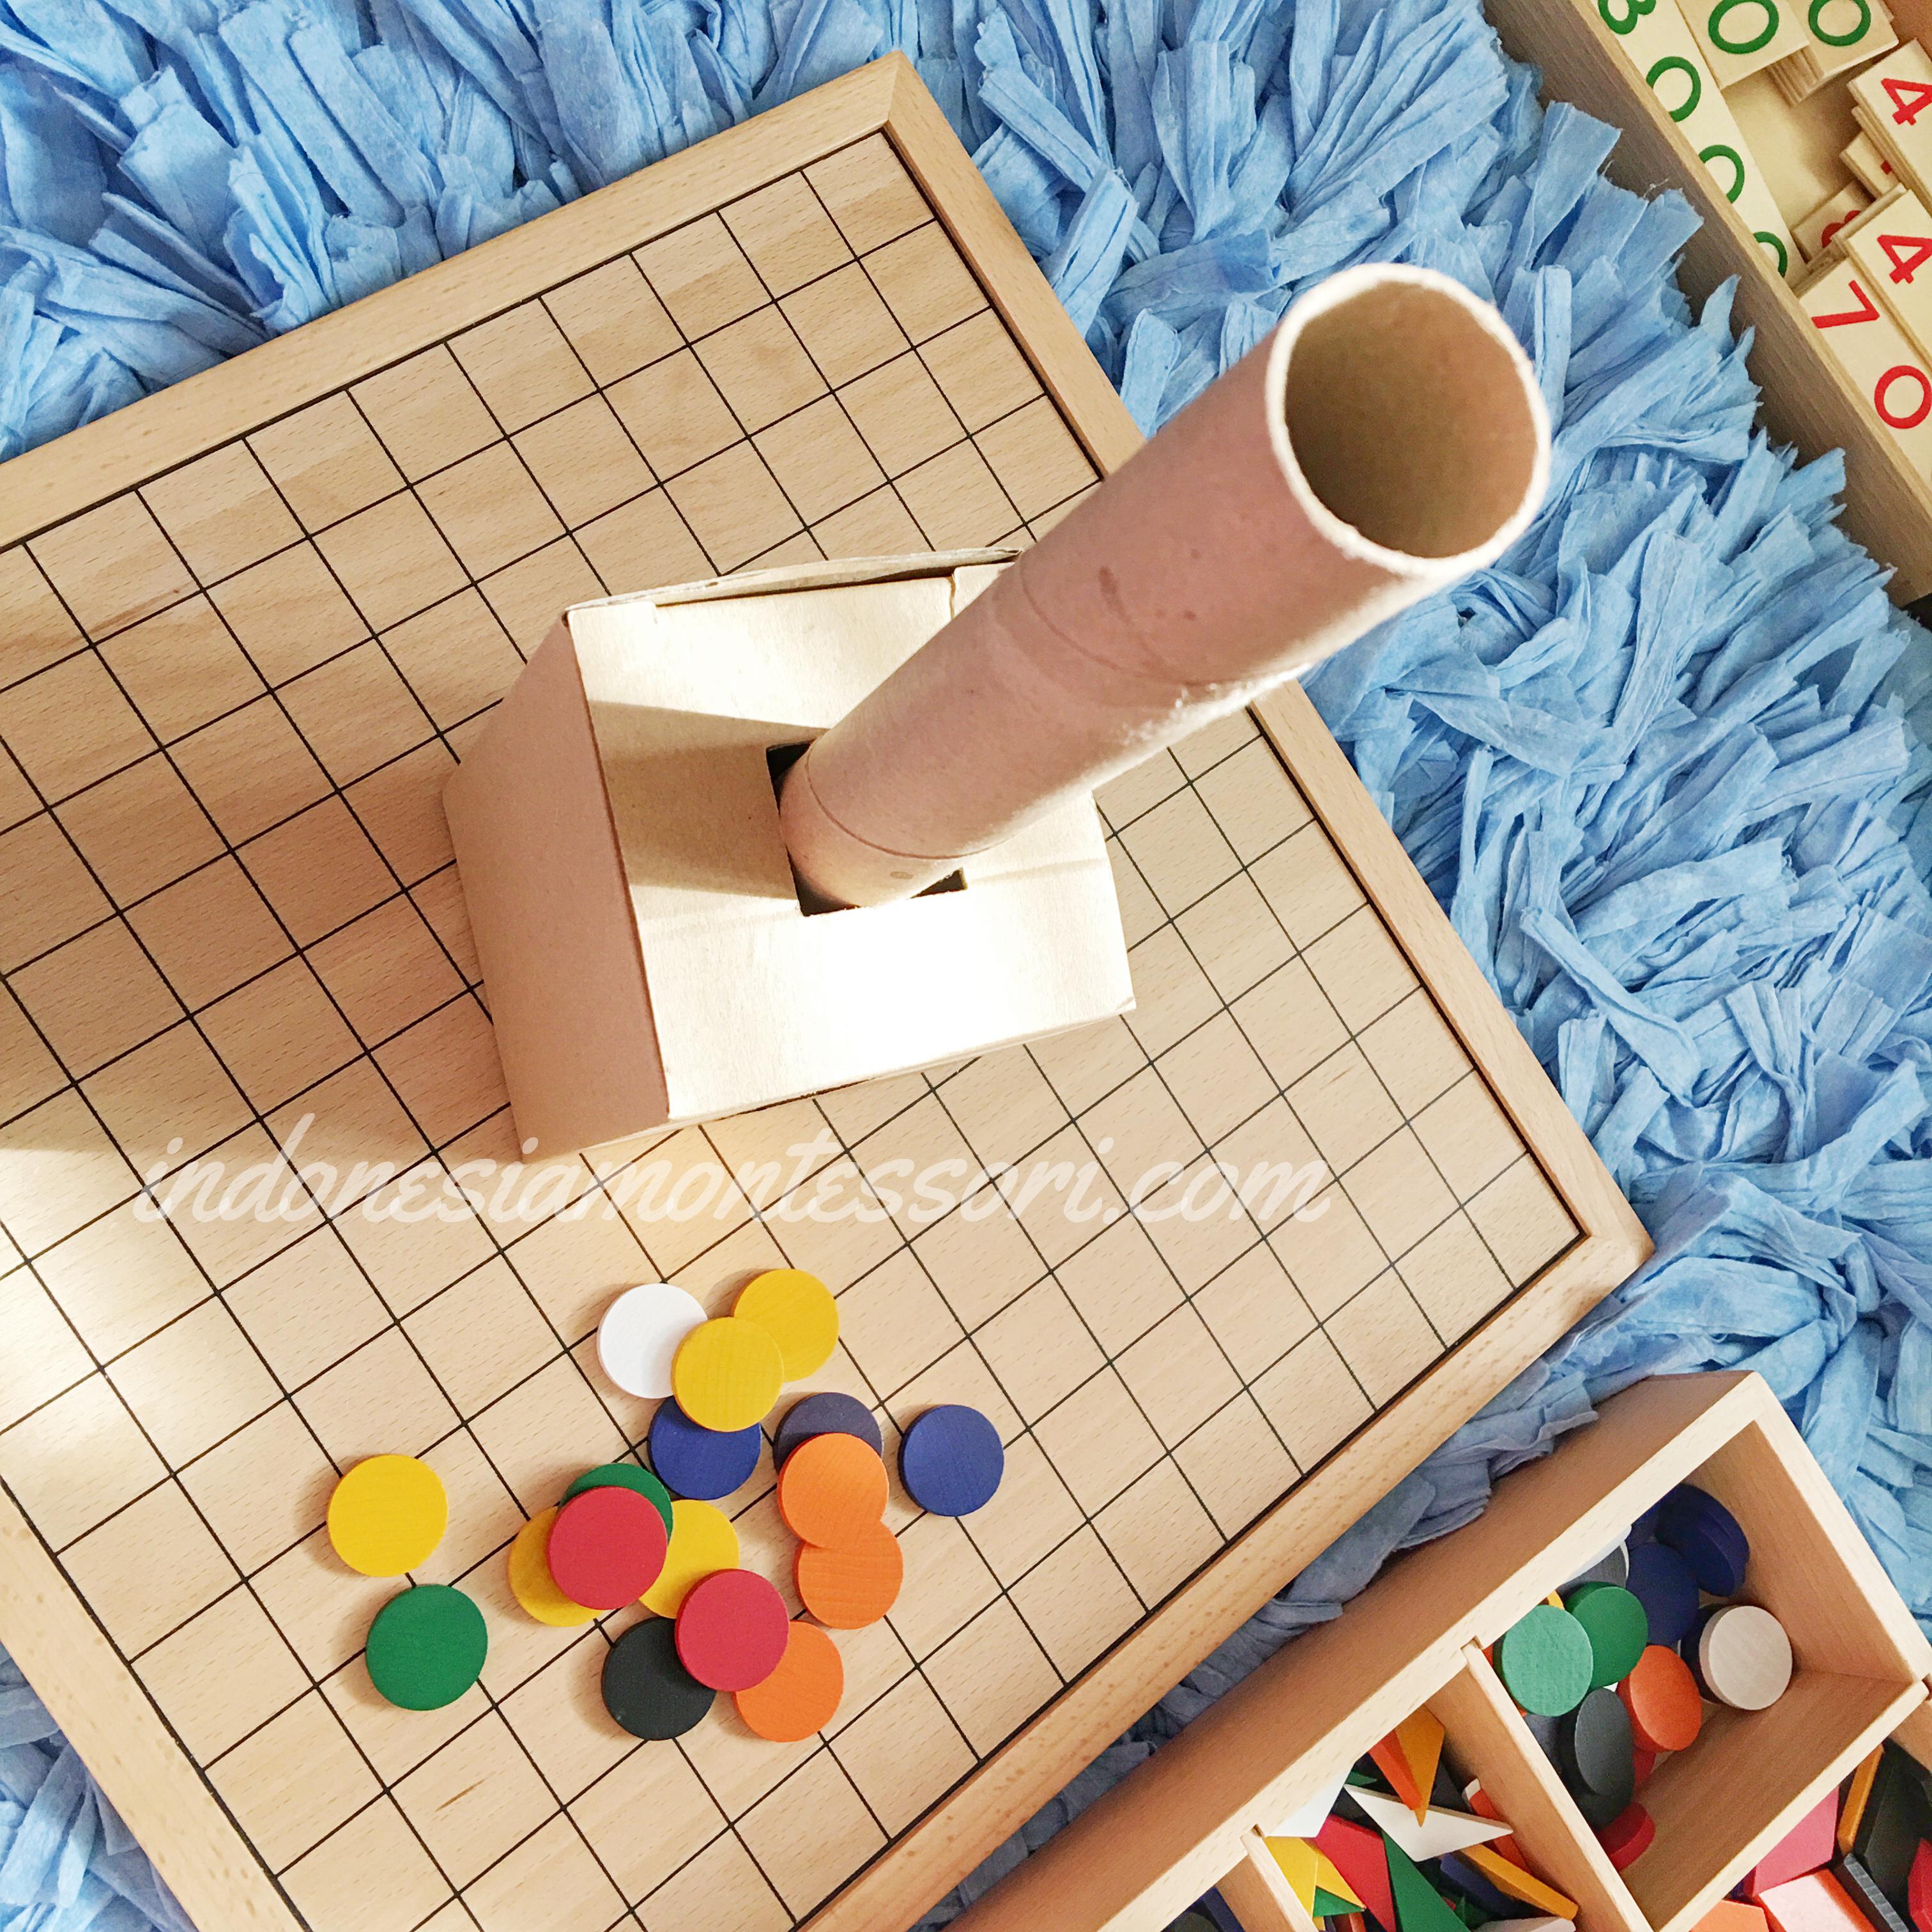 DIY Object Permanence IMC Imbucare Box Montessori